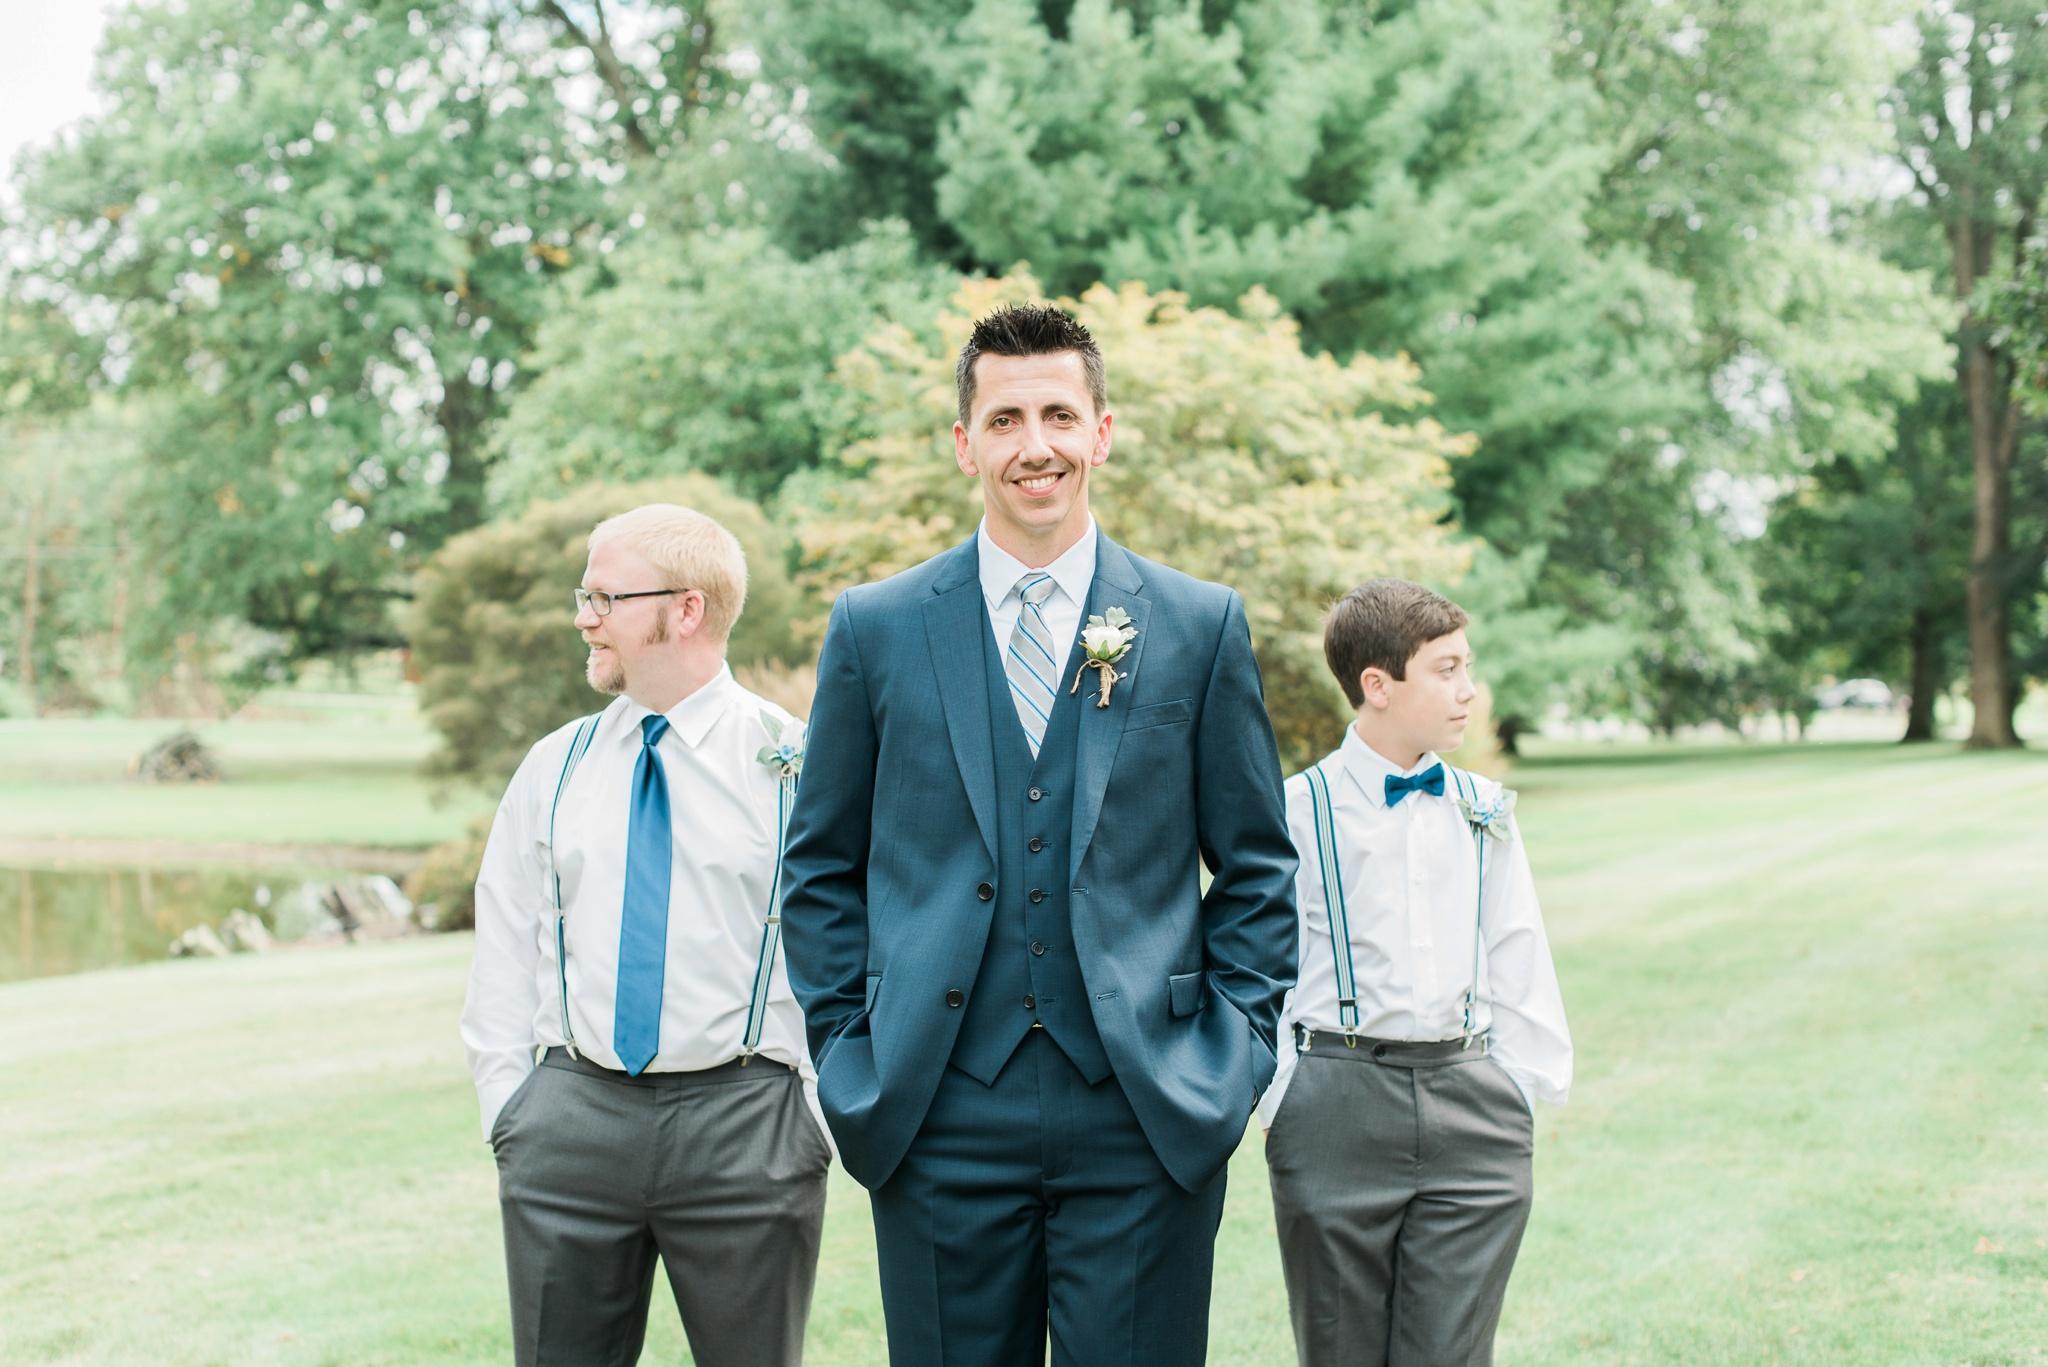 beverly-mansion-wedding-marengo-ohio-photographer_0067.jpg